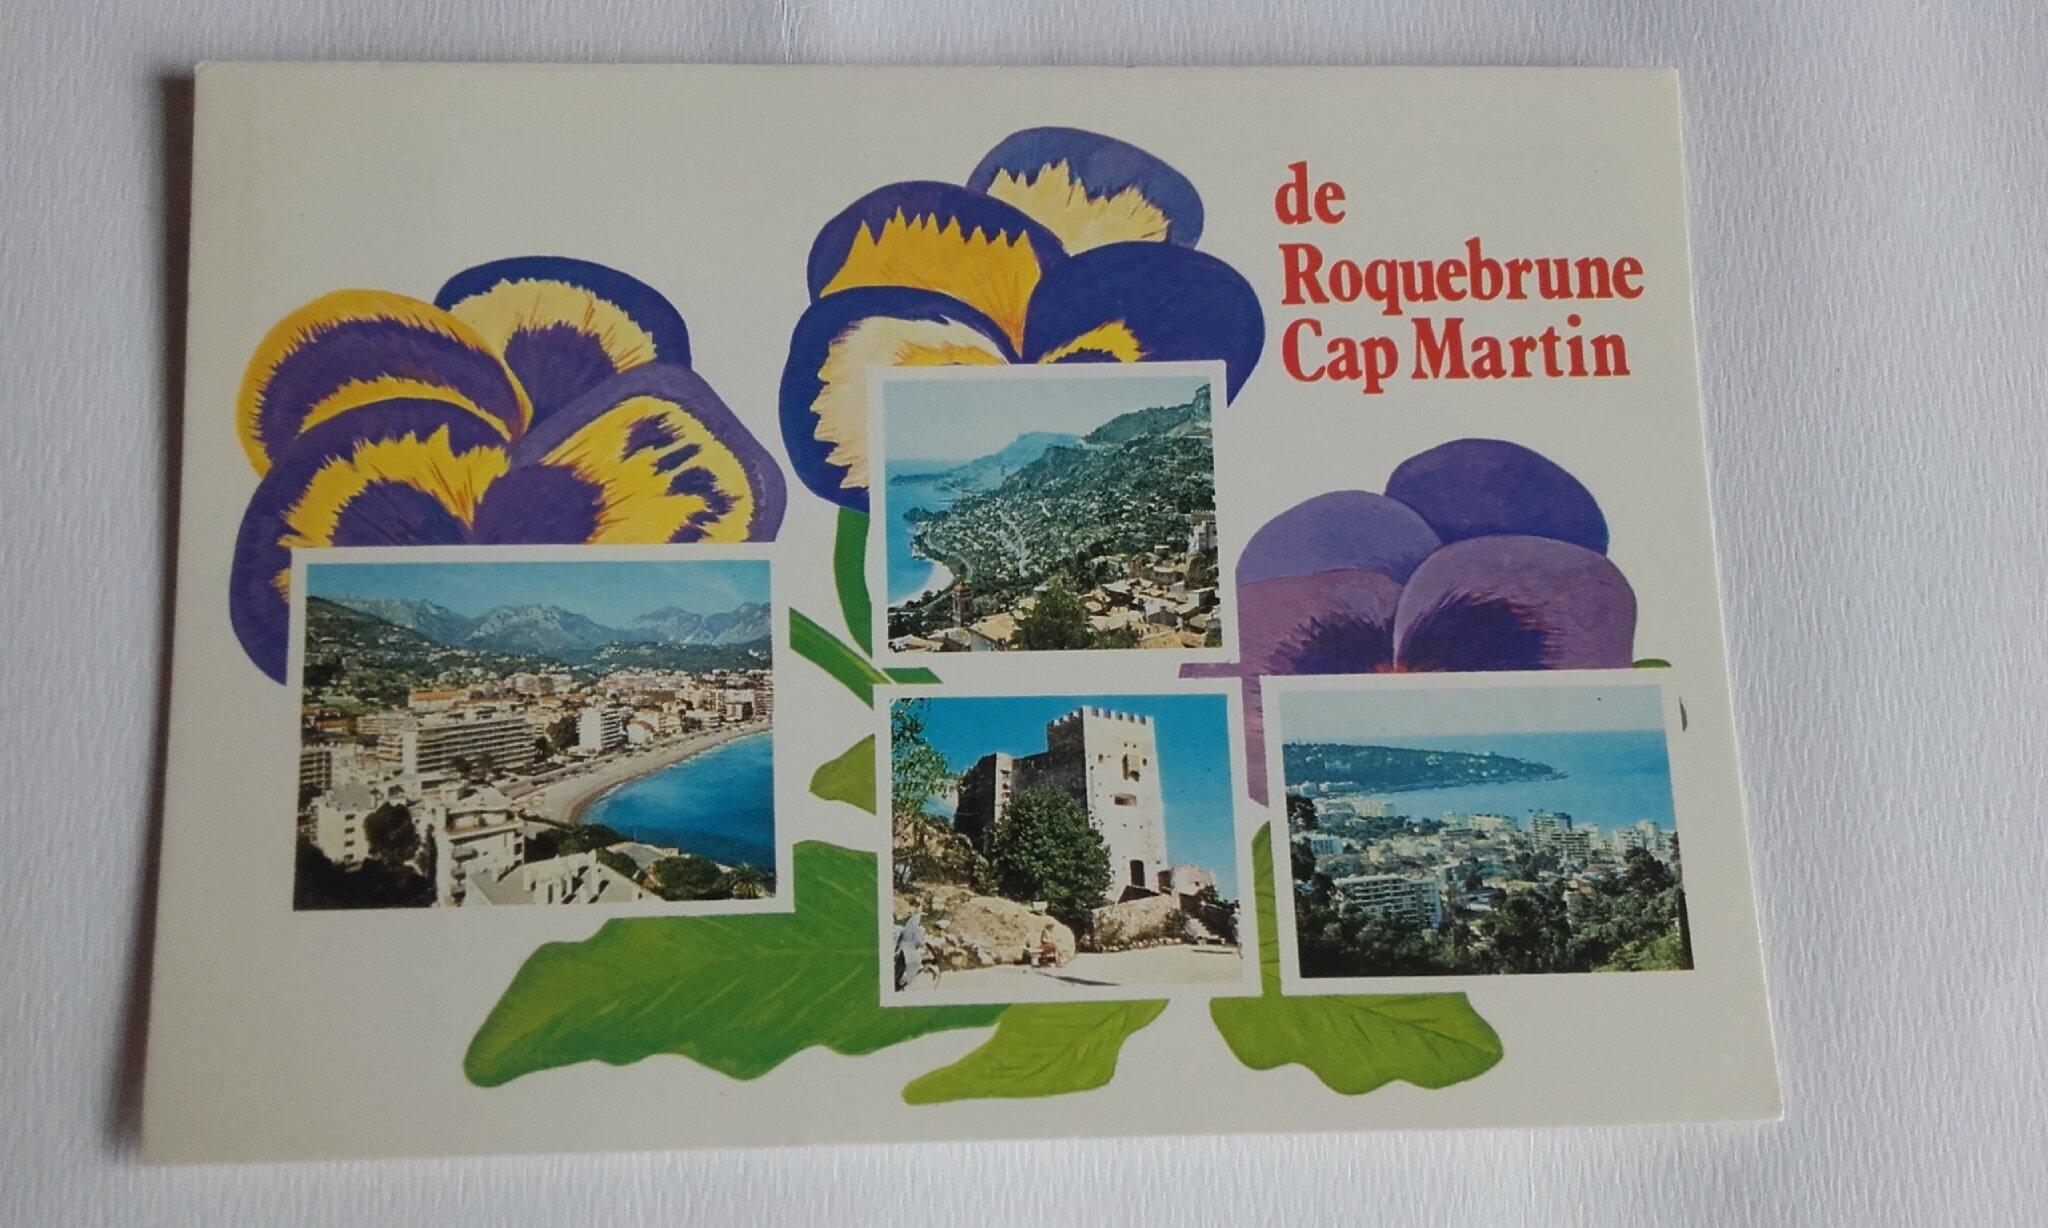 Roquebrune datée 1980